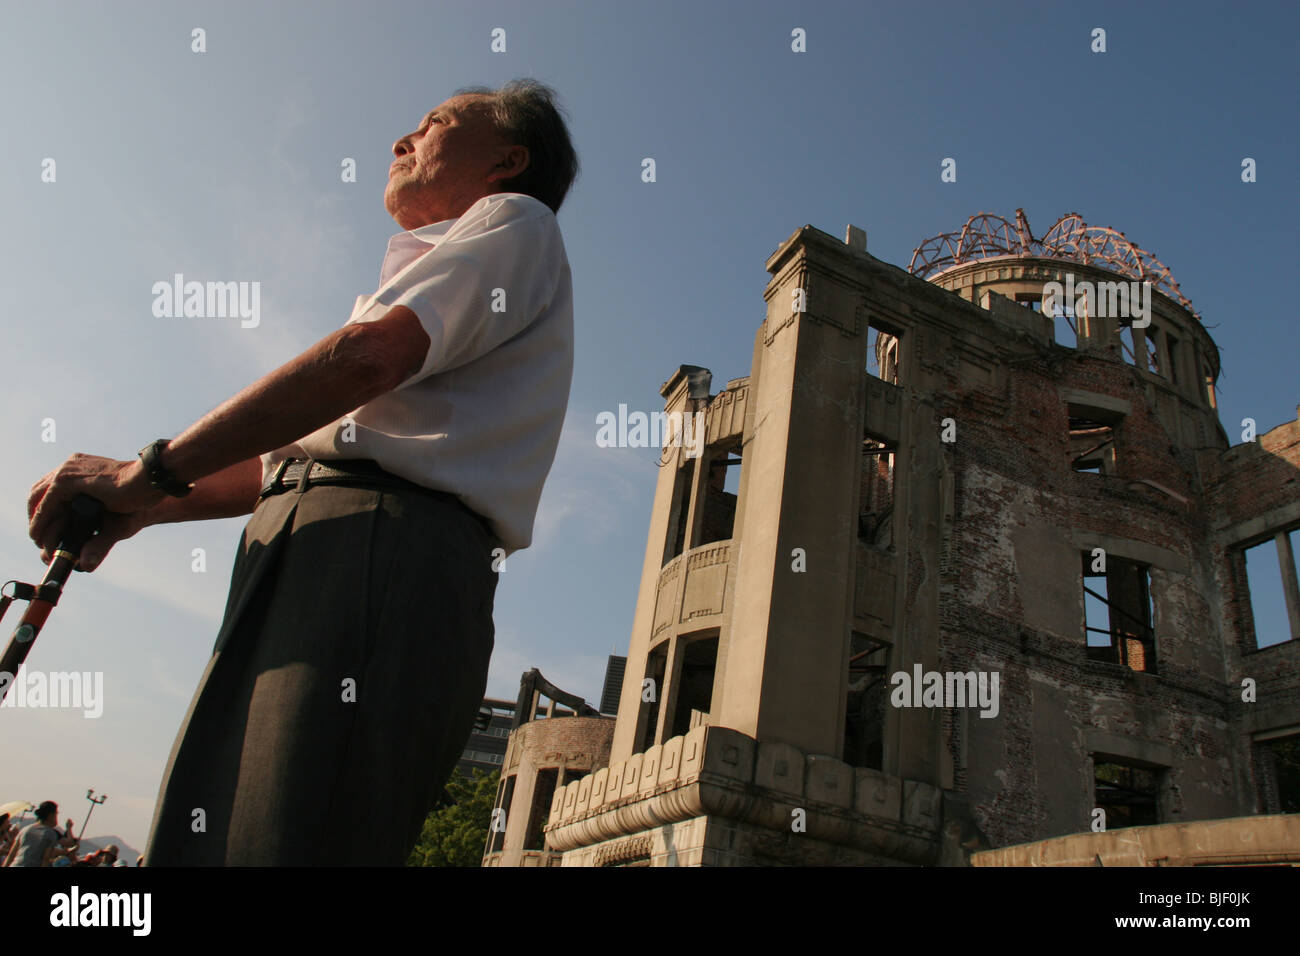 Seiko Komatsu, 69 years old, injured in the atomic bomb blast of August 6th 1945 in Hiroshima, Japan. - Stock Image